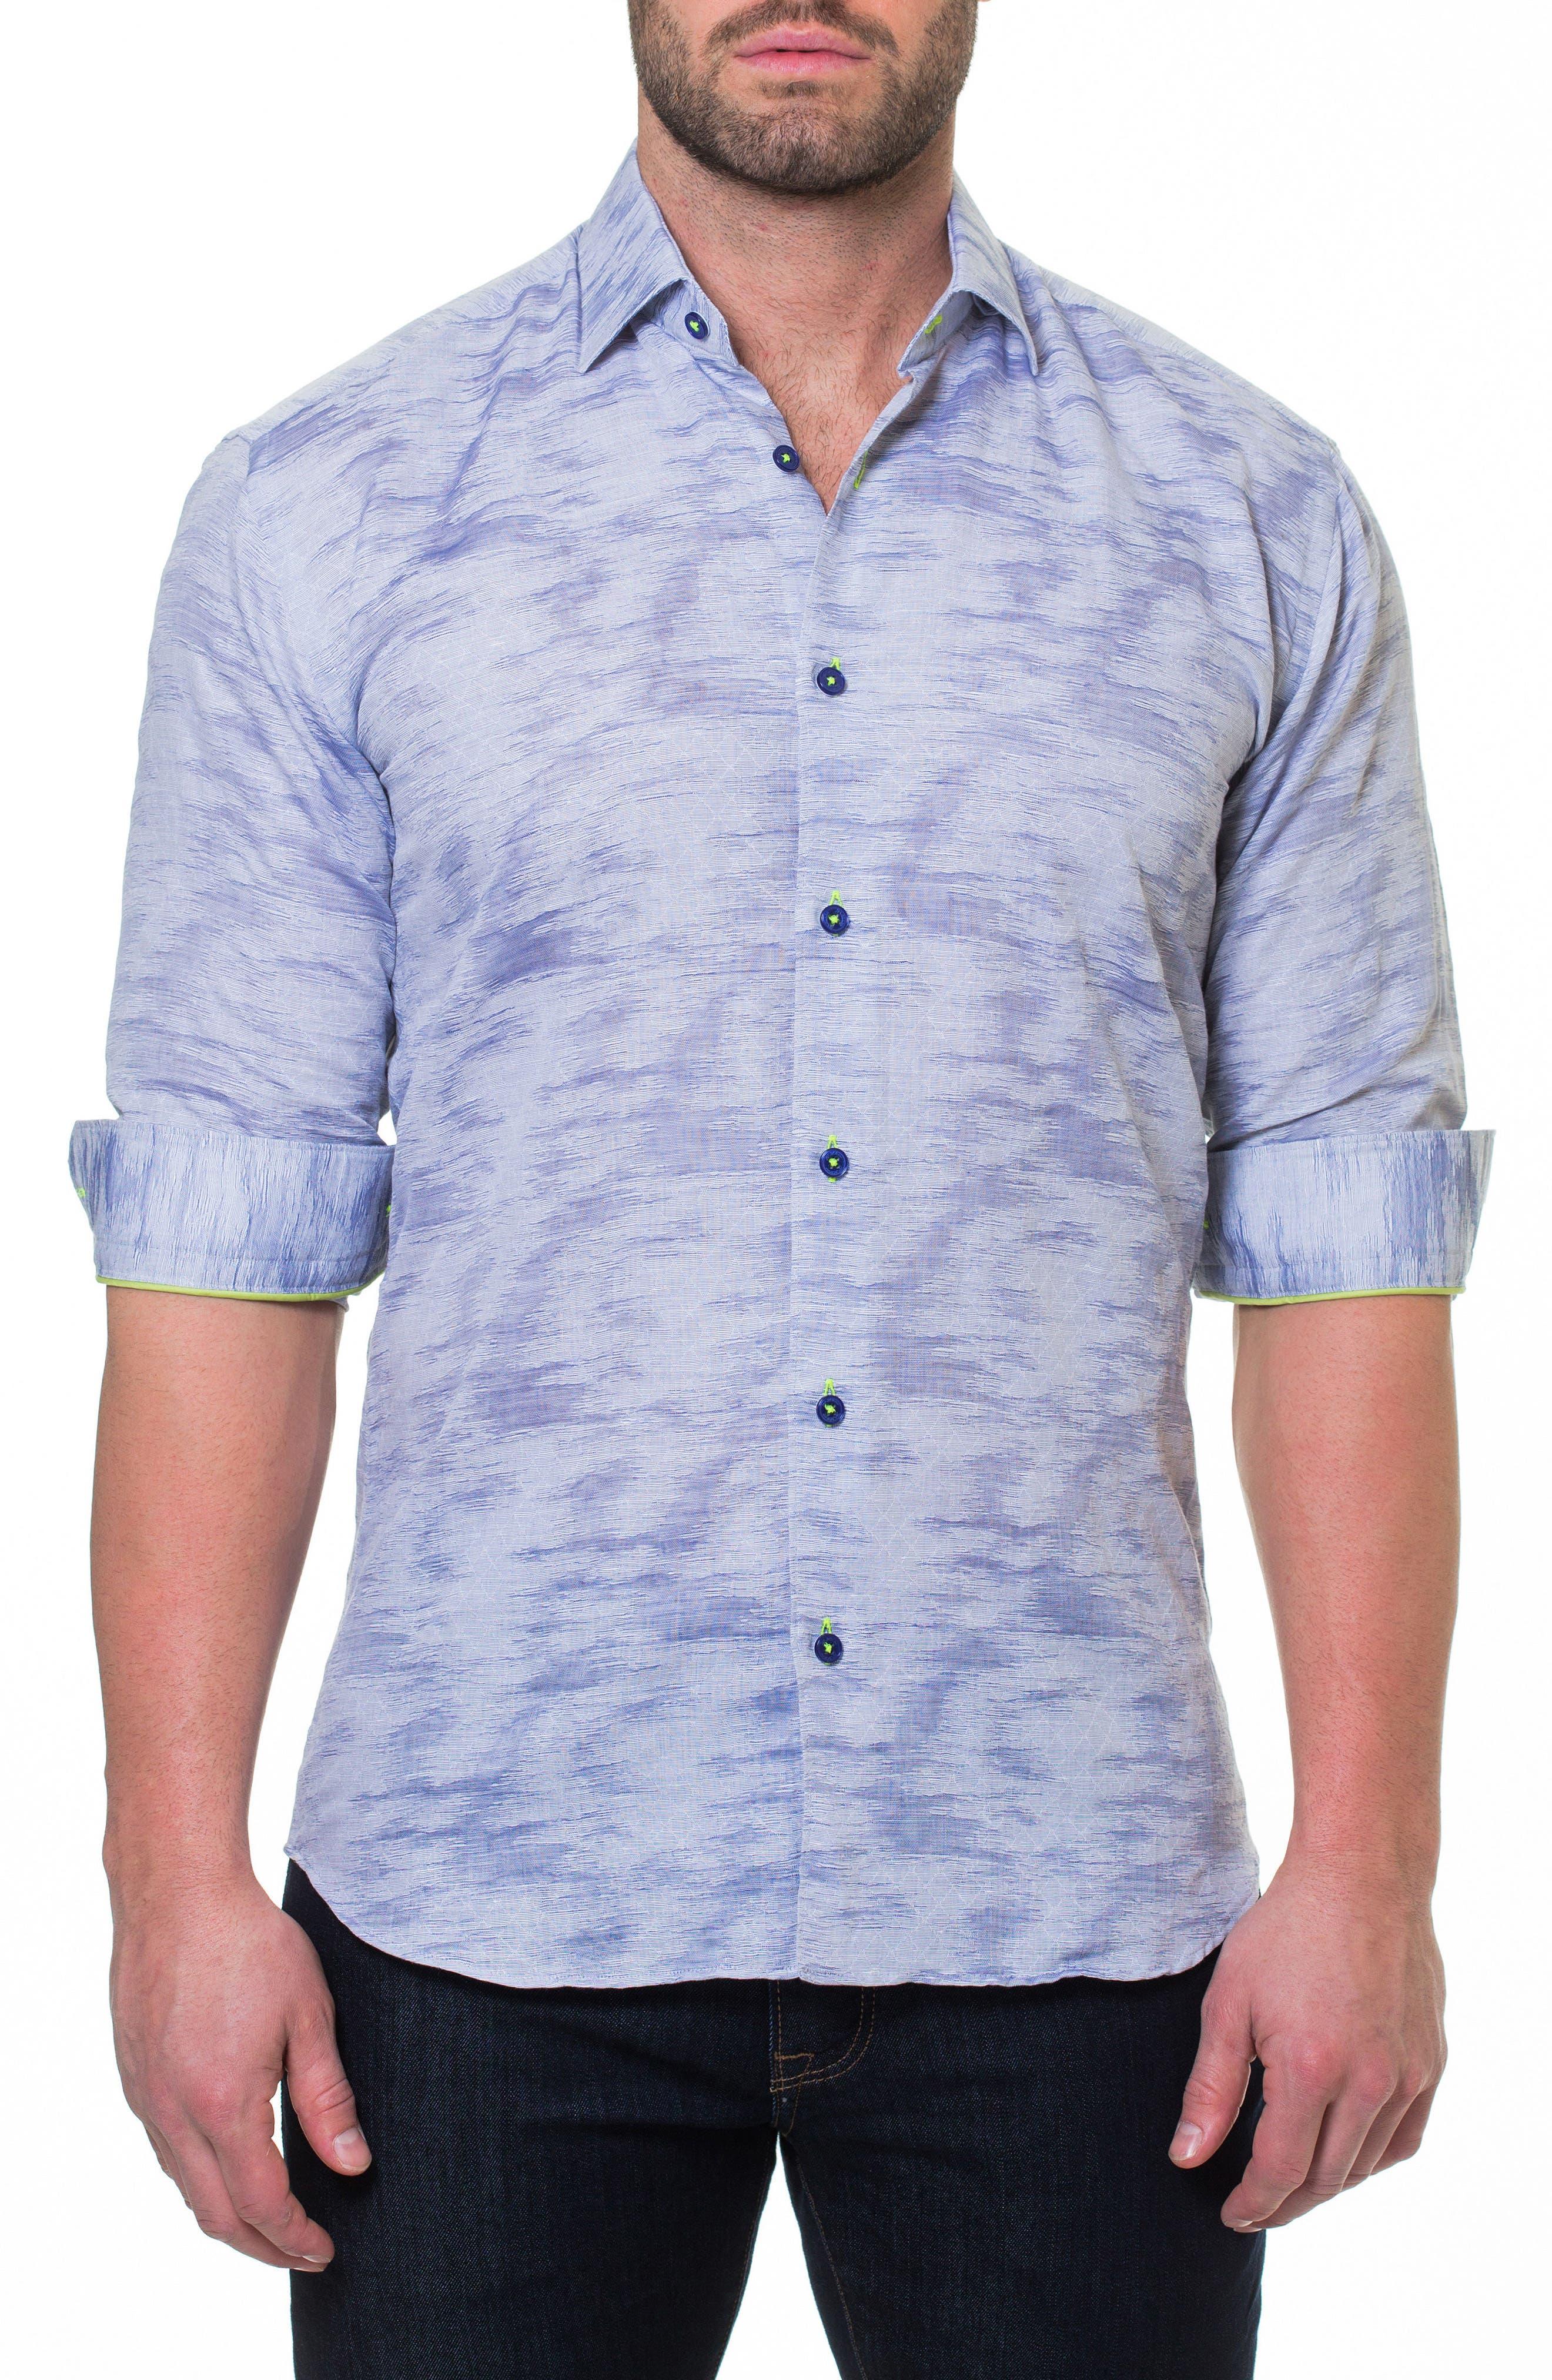 Luxor Richter Slim Fit Sport Shirt,                         Main,                         color, 030